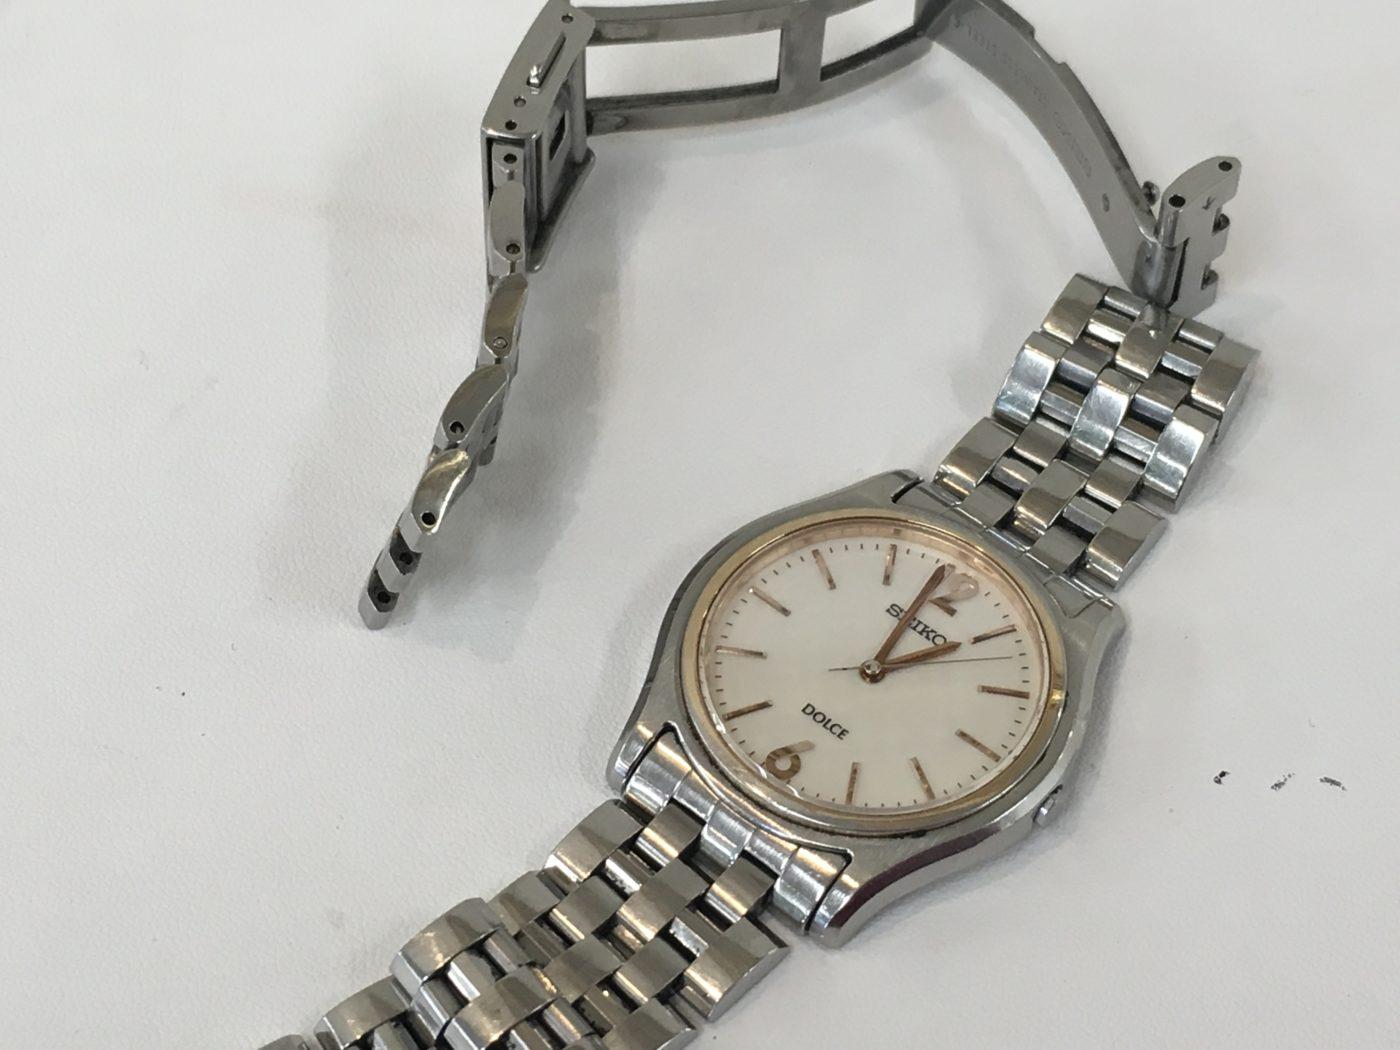 SEIKO DOLCE セイコー 腕時計 ベルト修理 割りピン